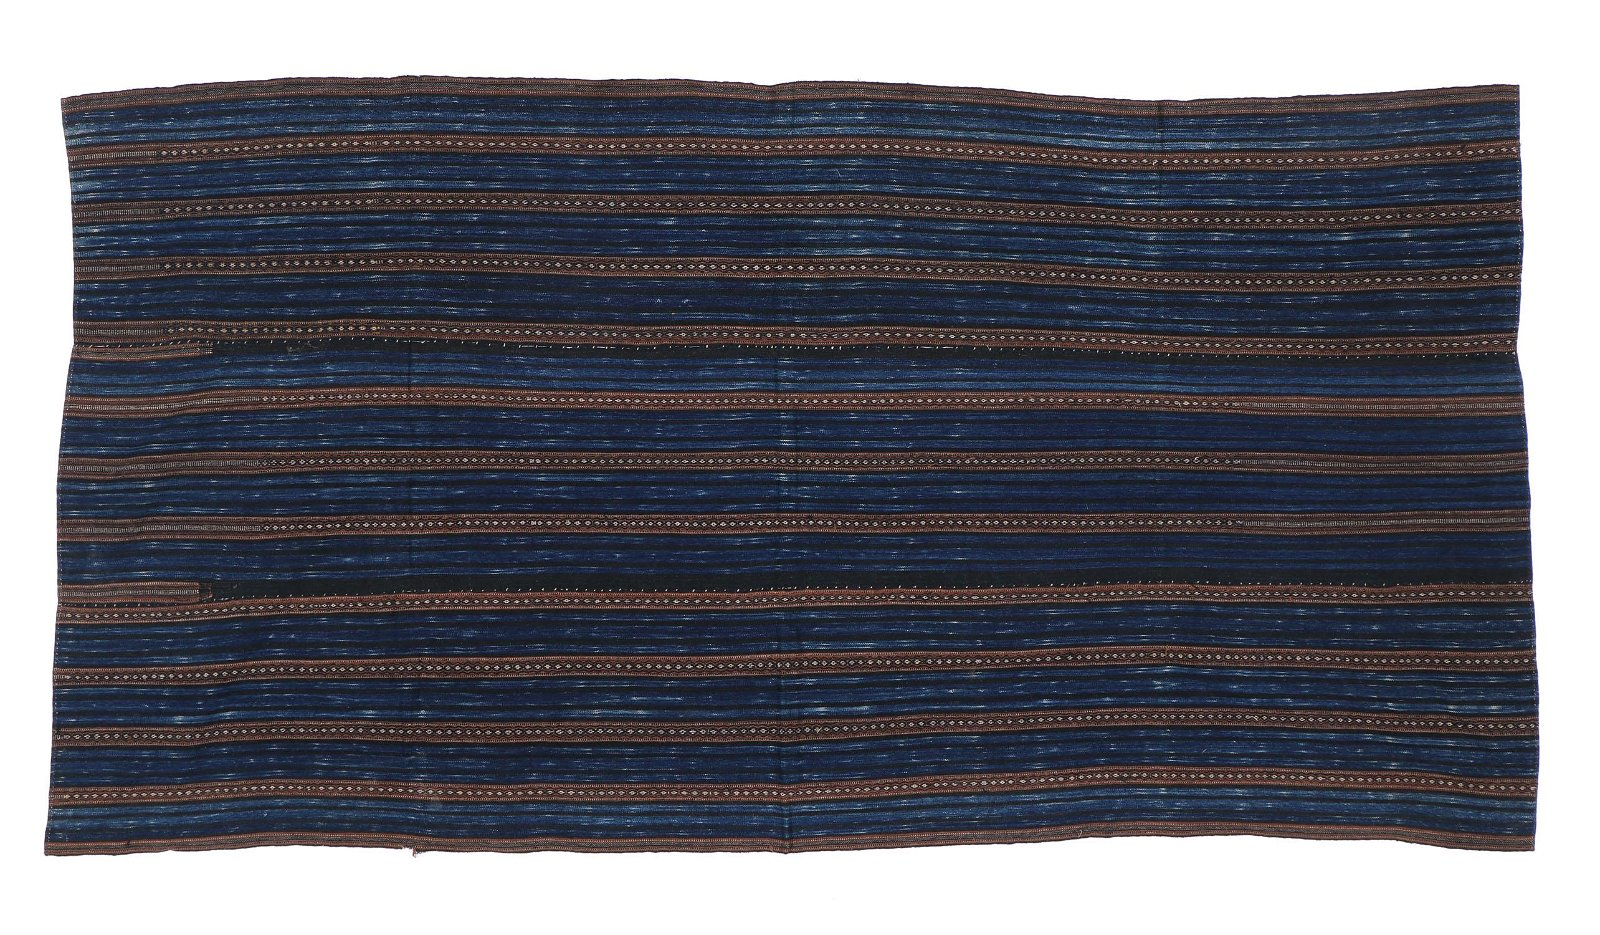 Li Cotton Blanket Chinese Textile, Hainan, China